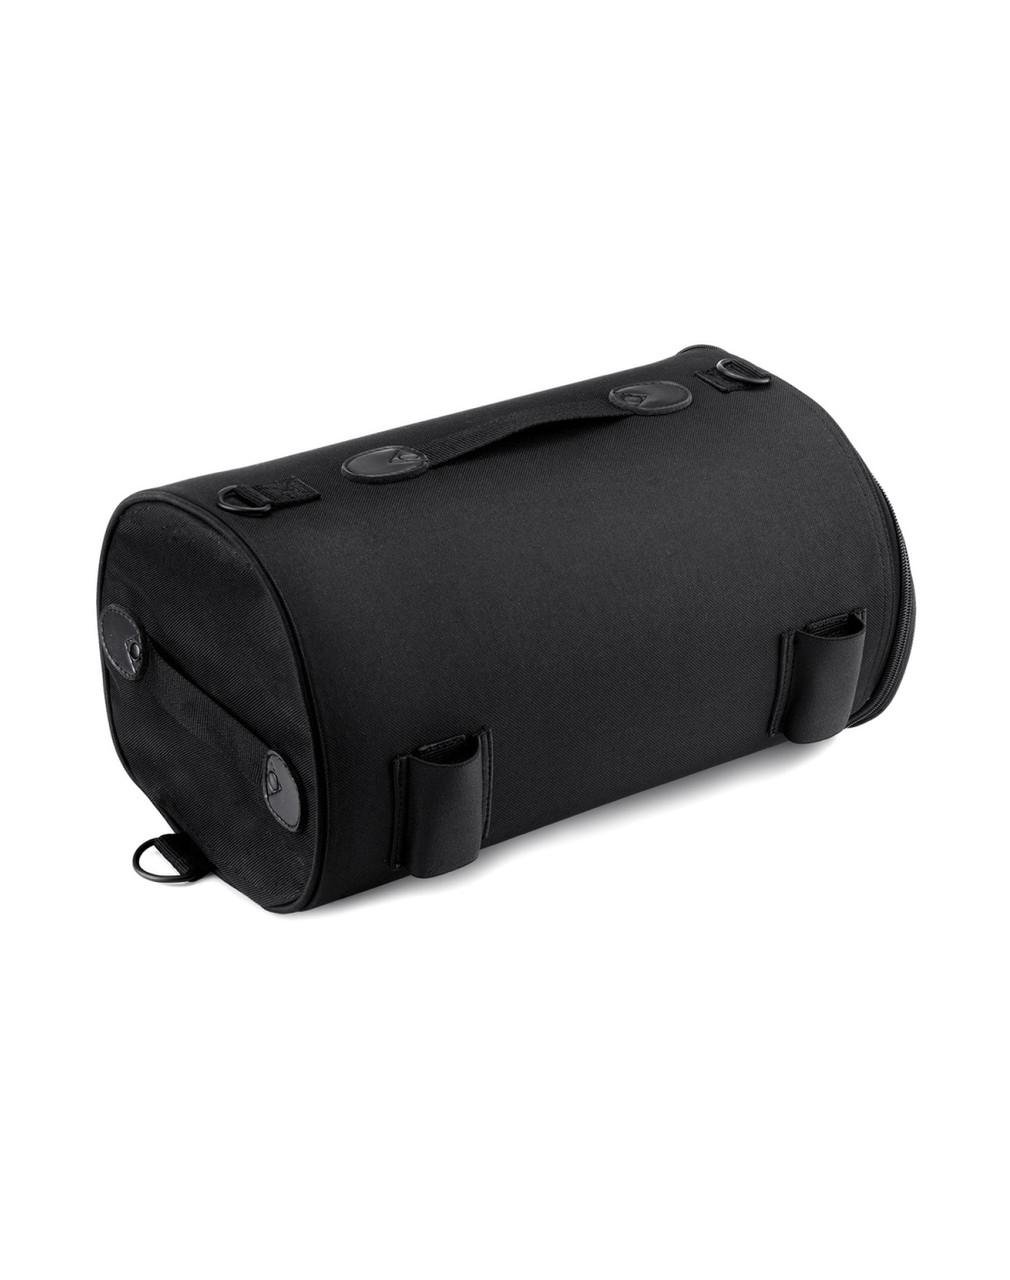 Honda Viking Extra Large Plain Motorcycle Sissy Bar Bag Roll Bag